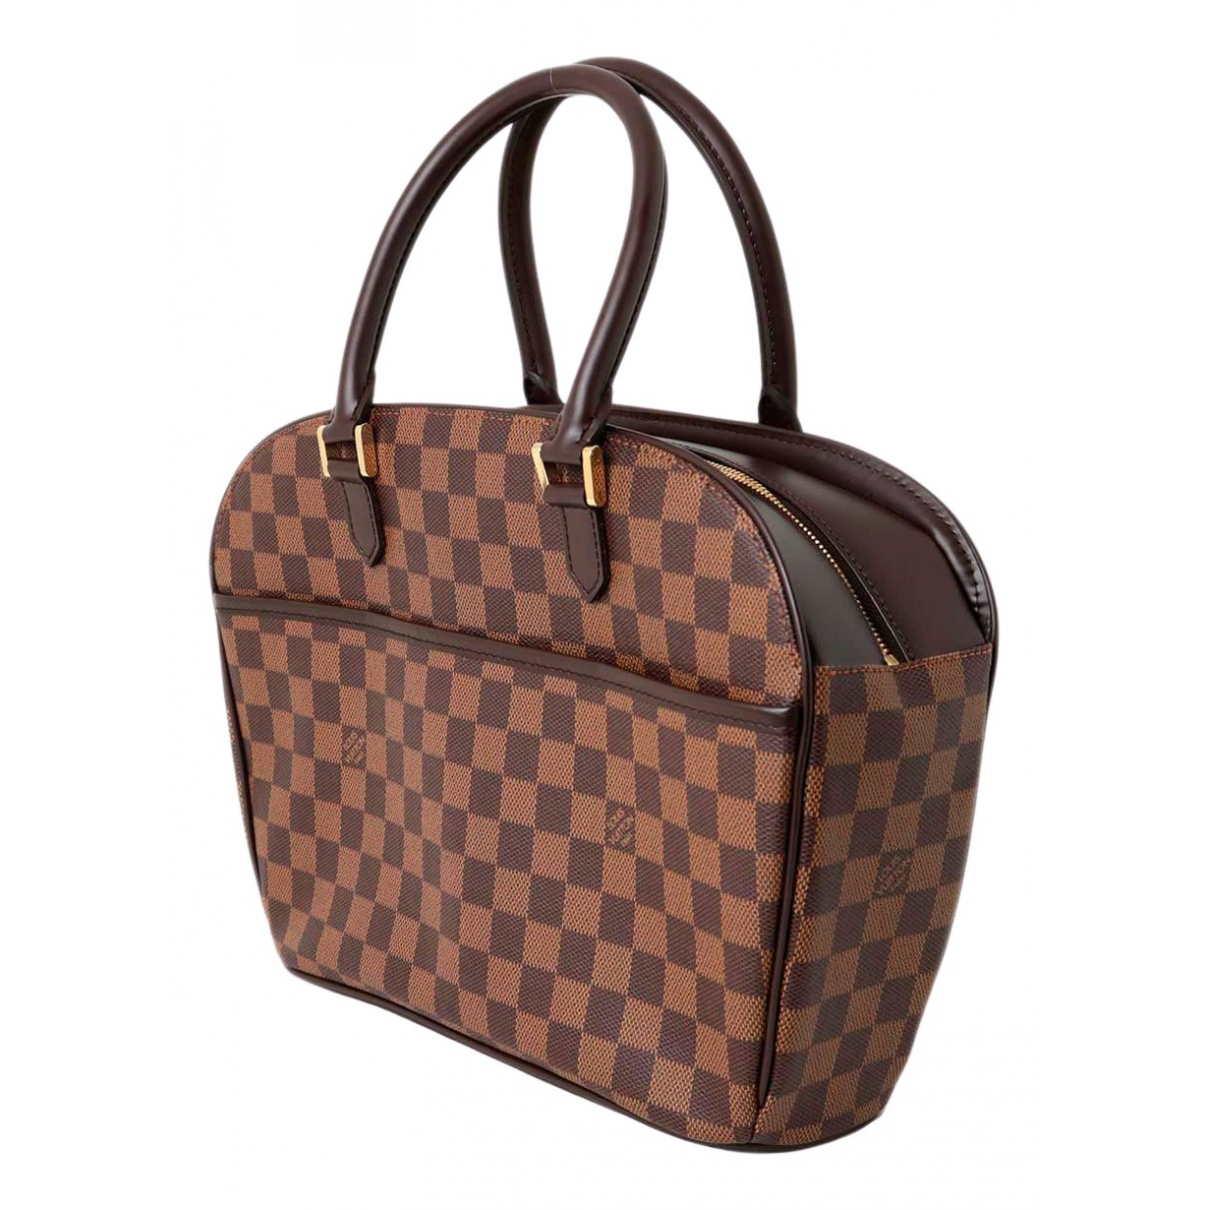 Louis Vuitton - Sac a main Sarria pour femme en toile - marron